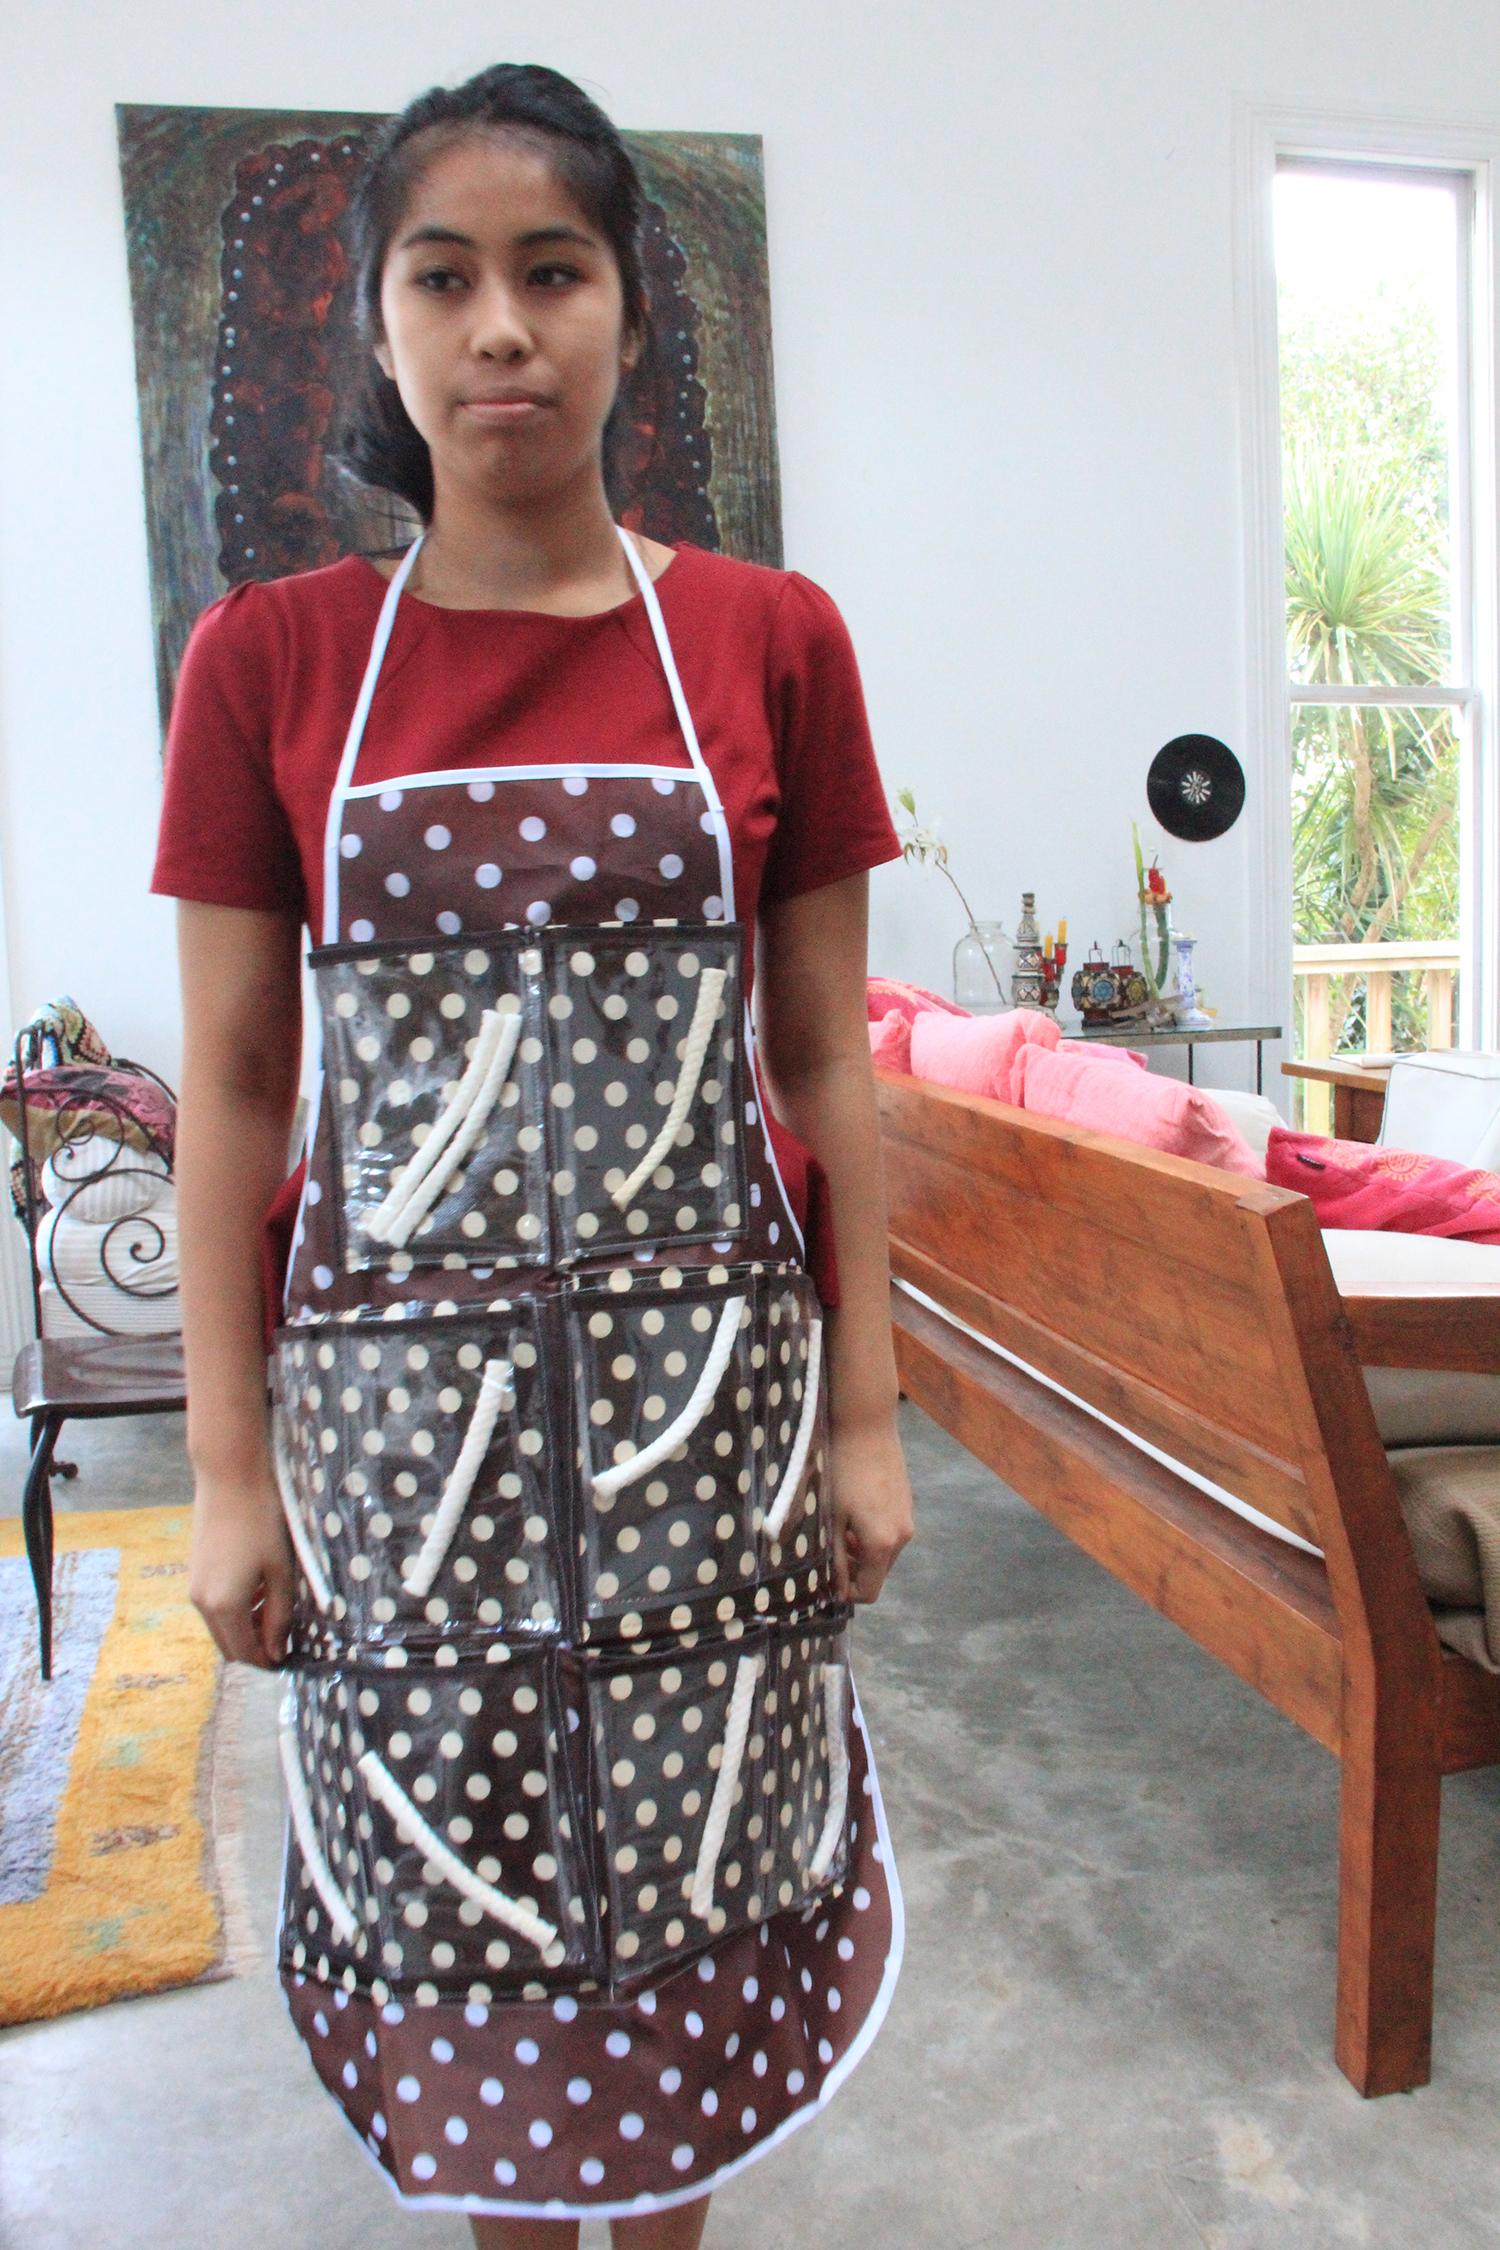 Jane Nimsoongnem models the perfume stick apron